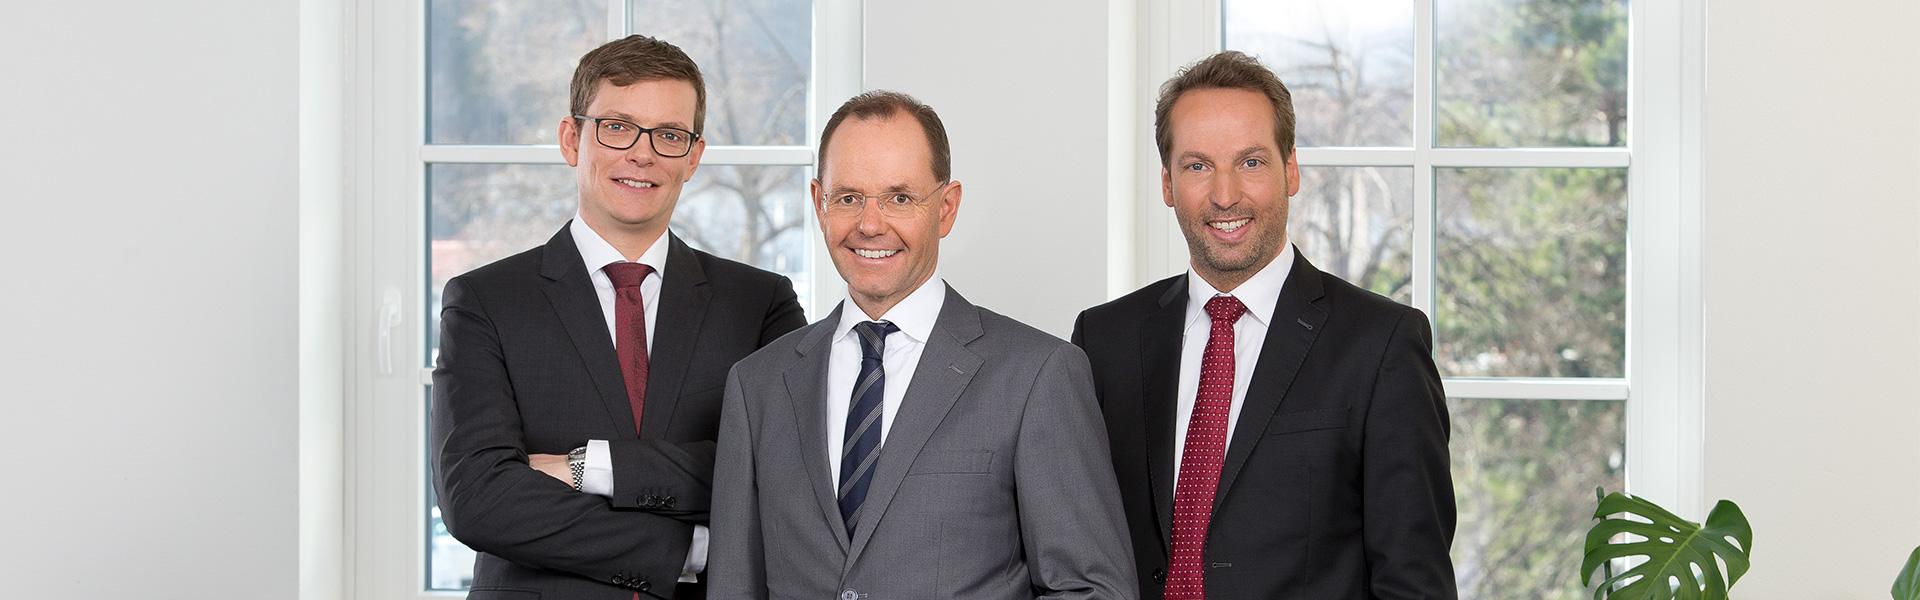 Penke Heinze Gehring - Partner